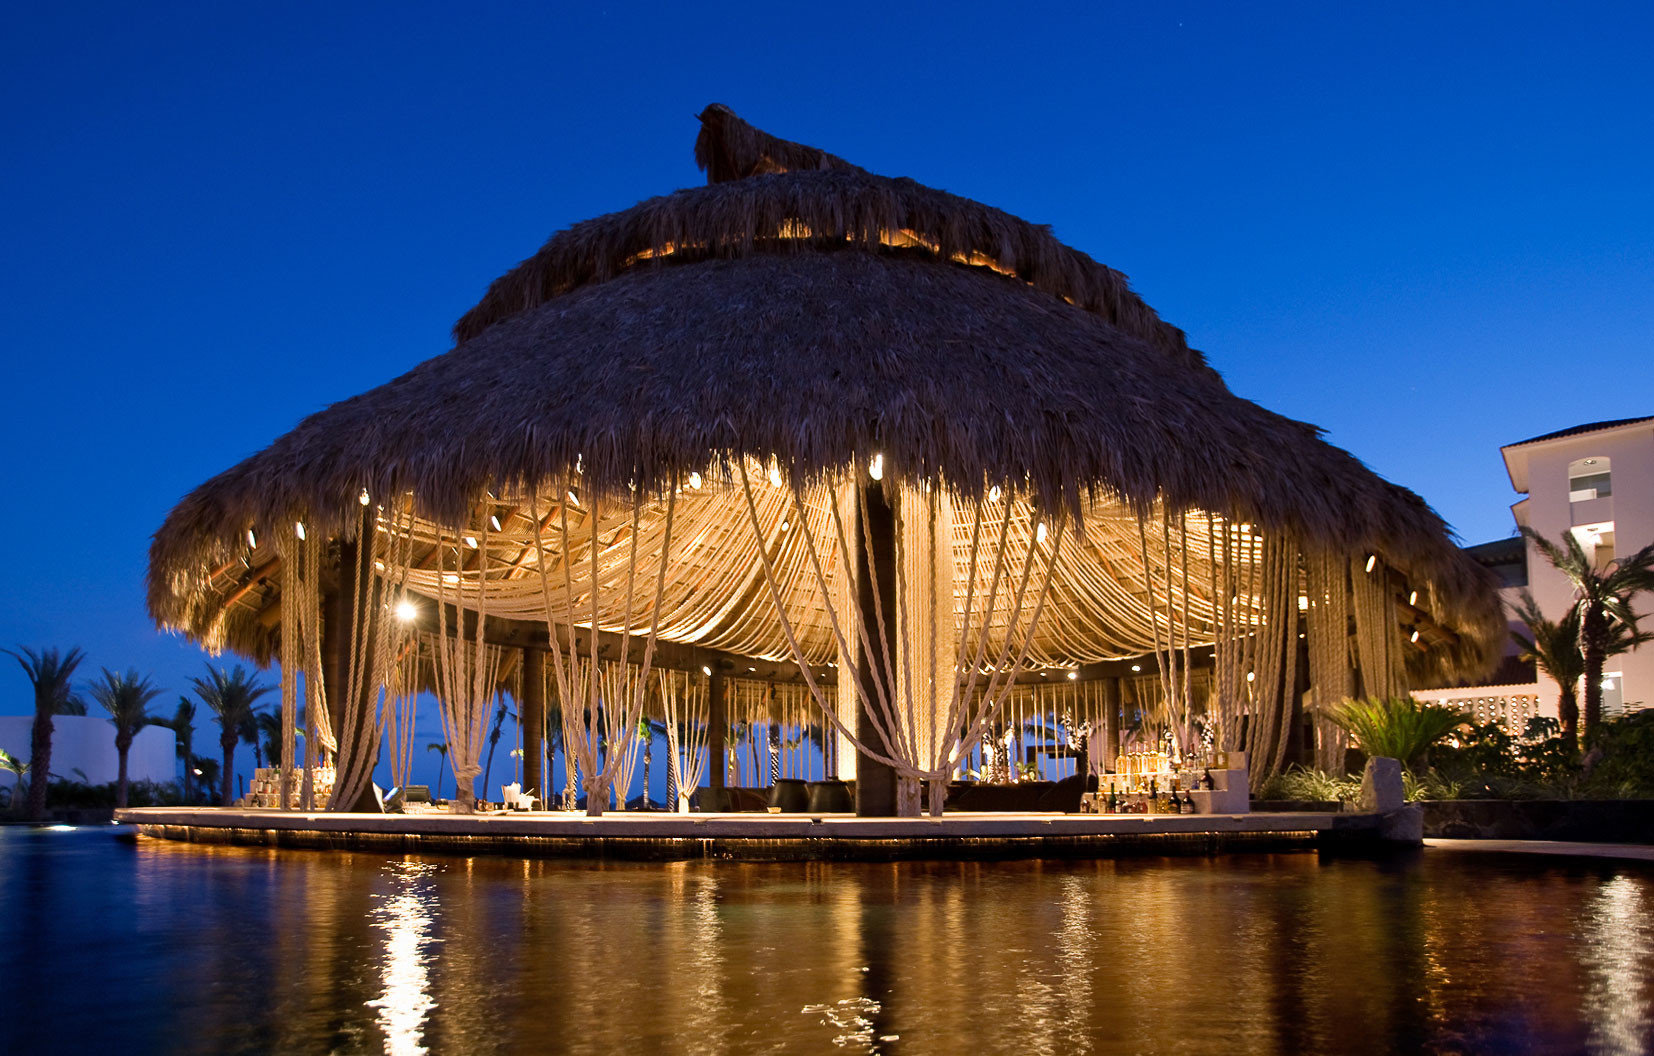 Luxury Nightlife Scenic views Tropical Waterfront sky water landmark night evening Resort dusk place of worship